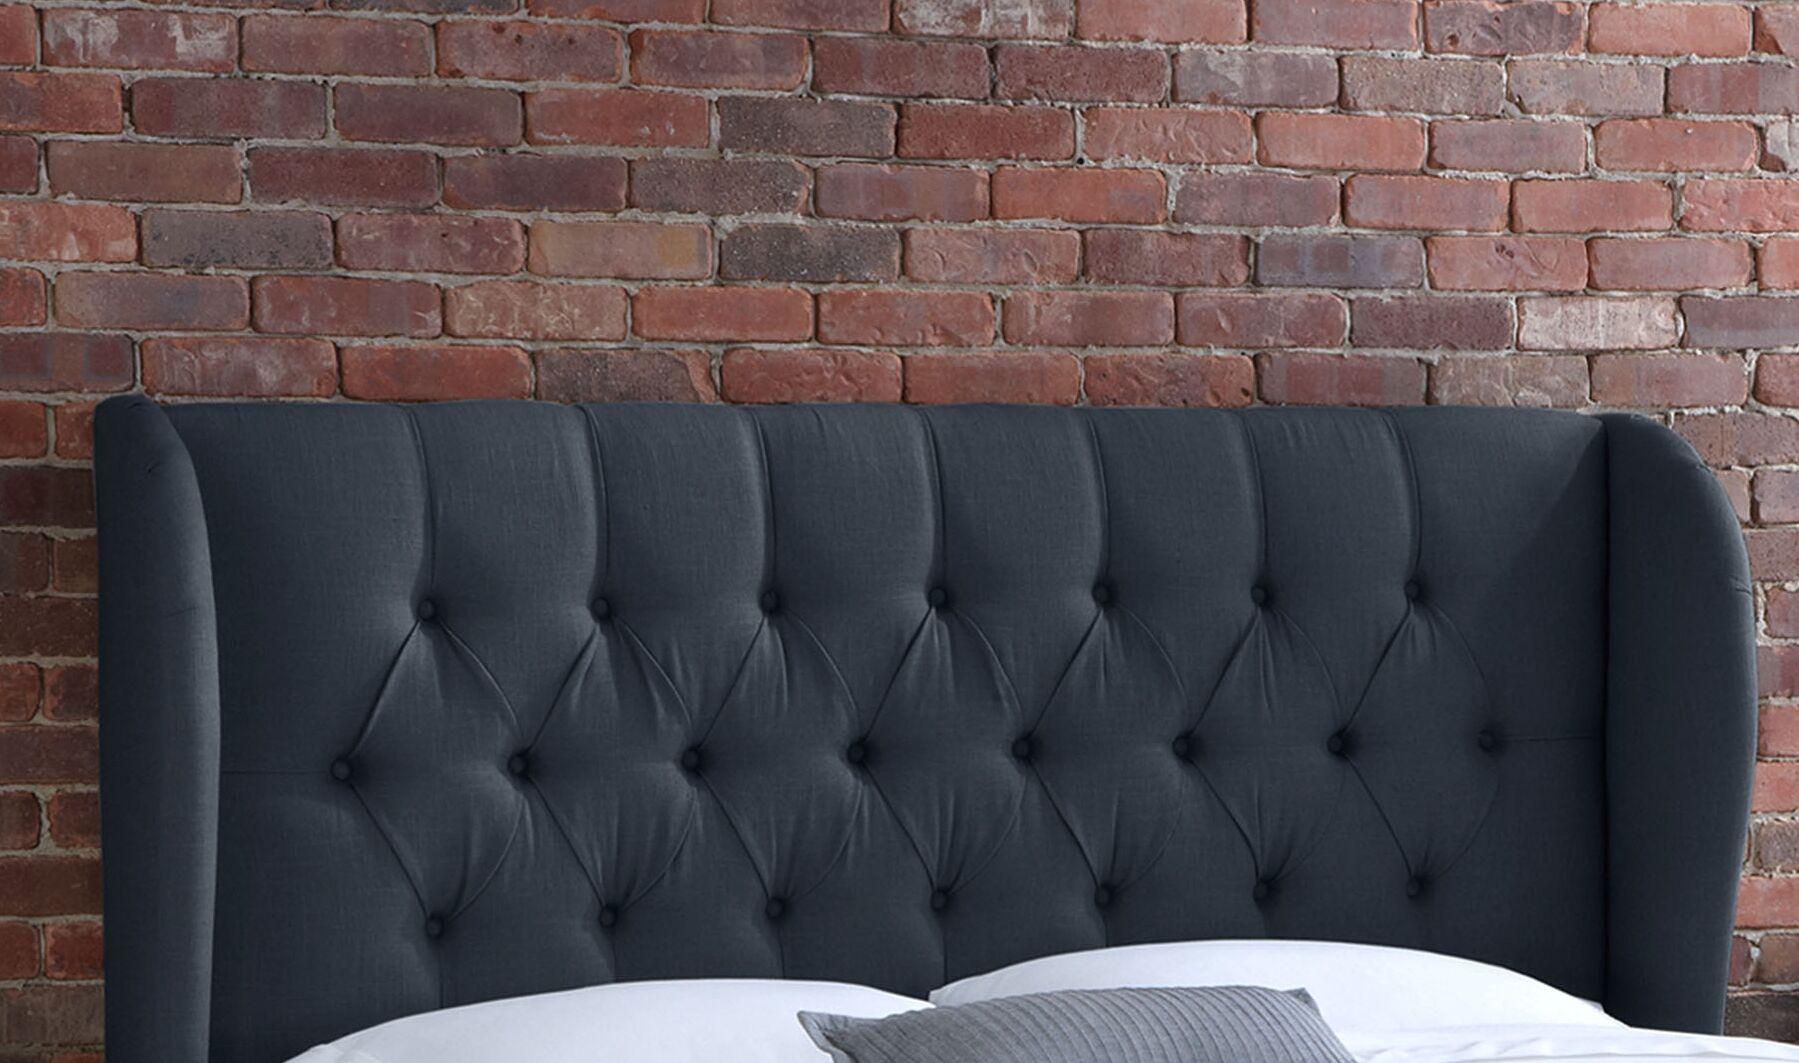 Stowmarket Tufted Diamond Upholstered Wingback Headboard Upholstery: Navy, Size: King